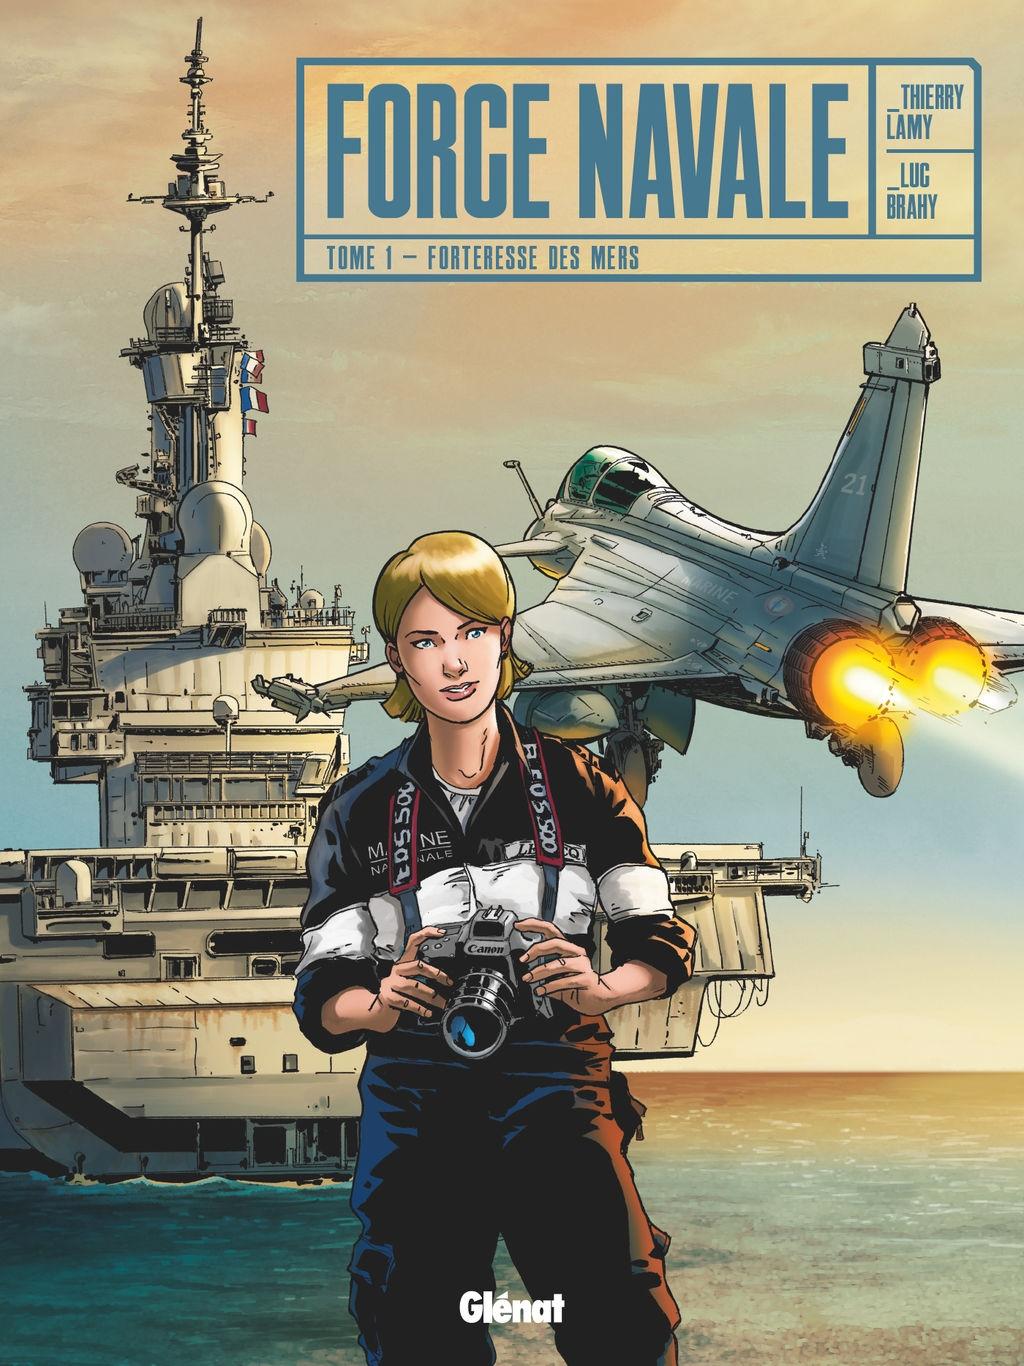 bd, Force navale, Forteresse des mers, marine nationale, immersion, Thierry Lamy, Luc Brahy, Glénat, porte-avions, charles-de-gaulle